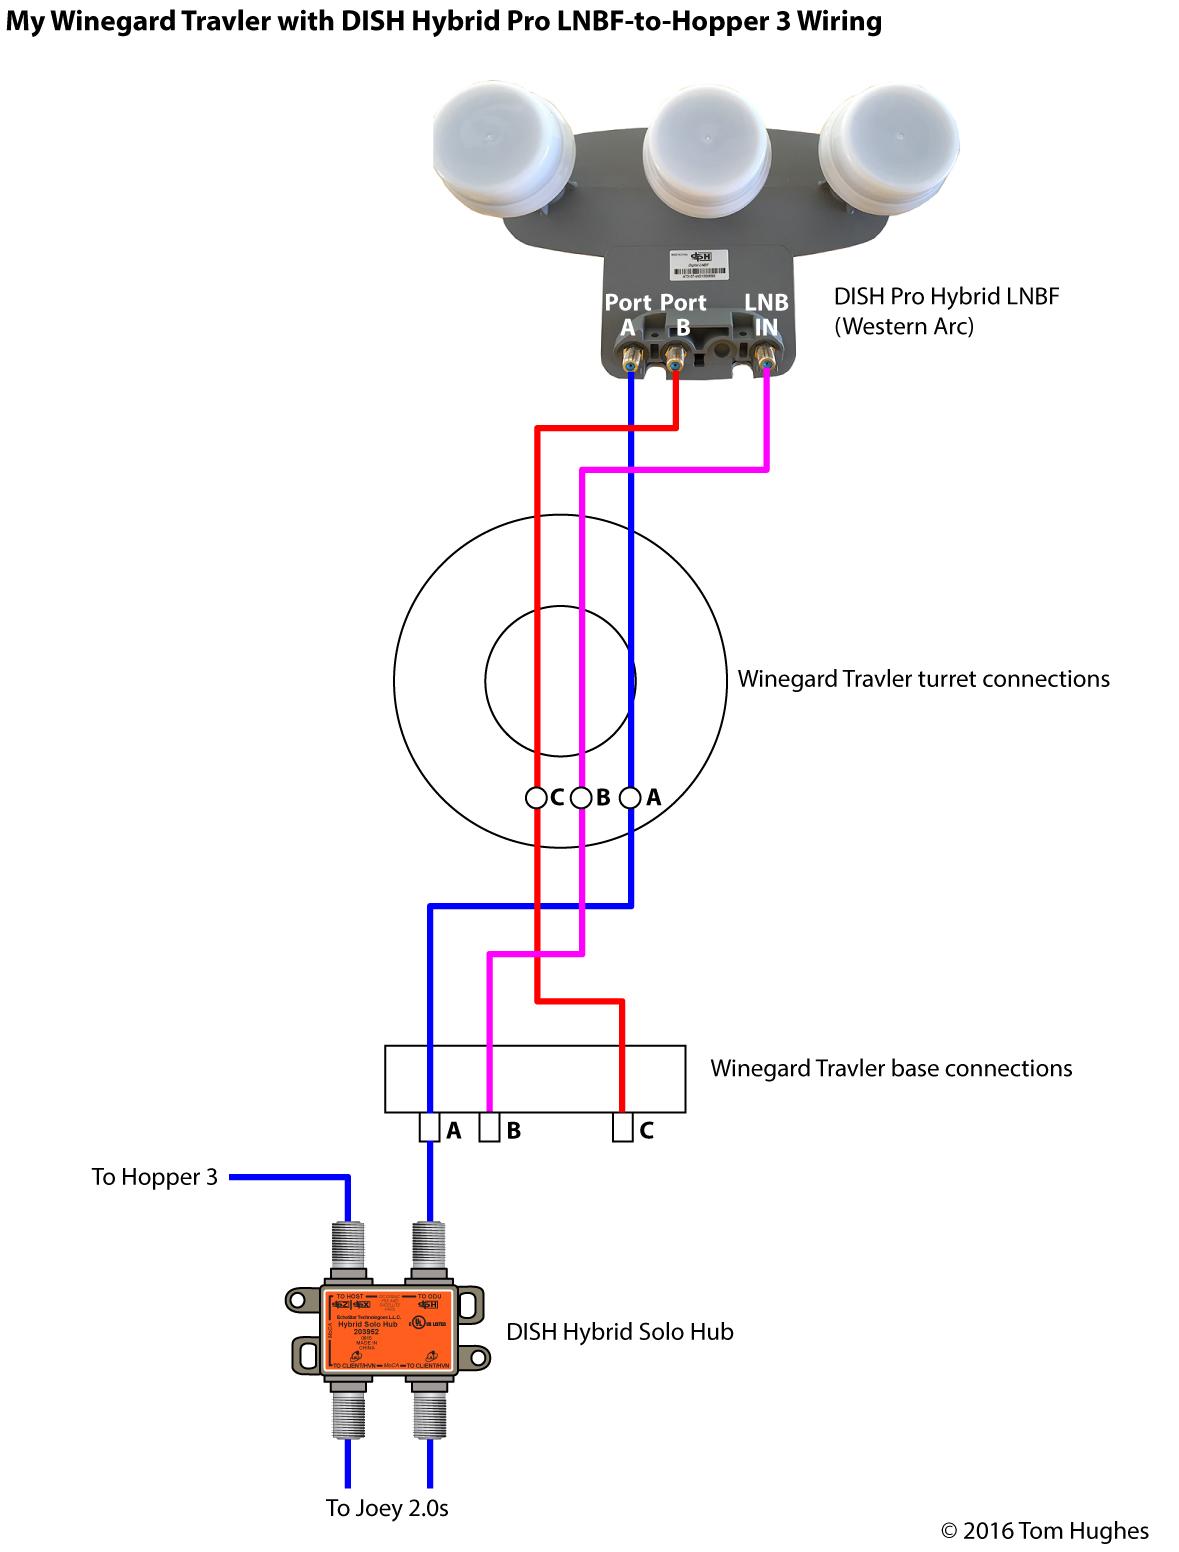 winegardtravlerhybrid to hopper3?w=620 dish pro hybrid winegard travler upgrade (no longer recommended hopper 3 wiring diagrams at nearapp.co